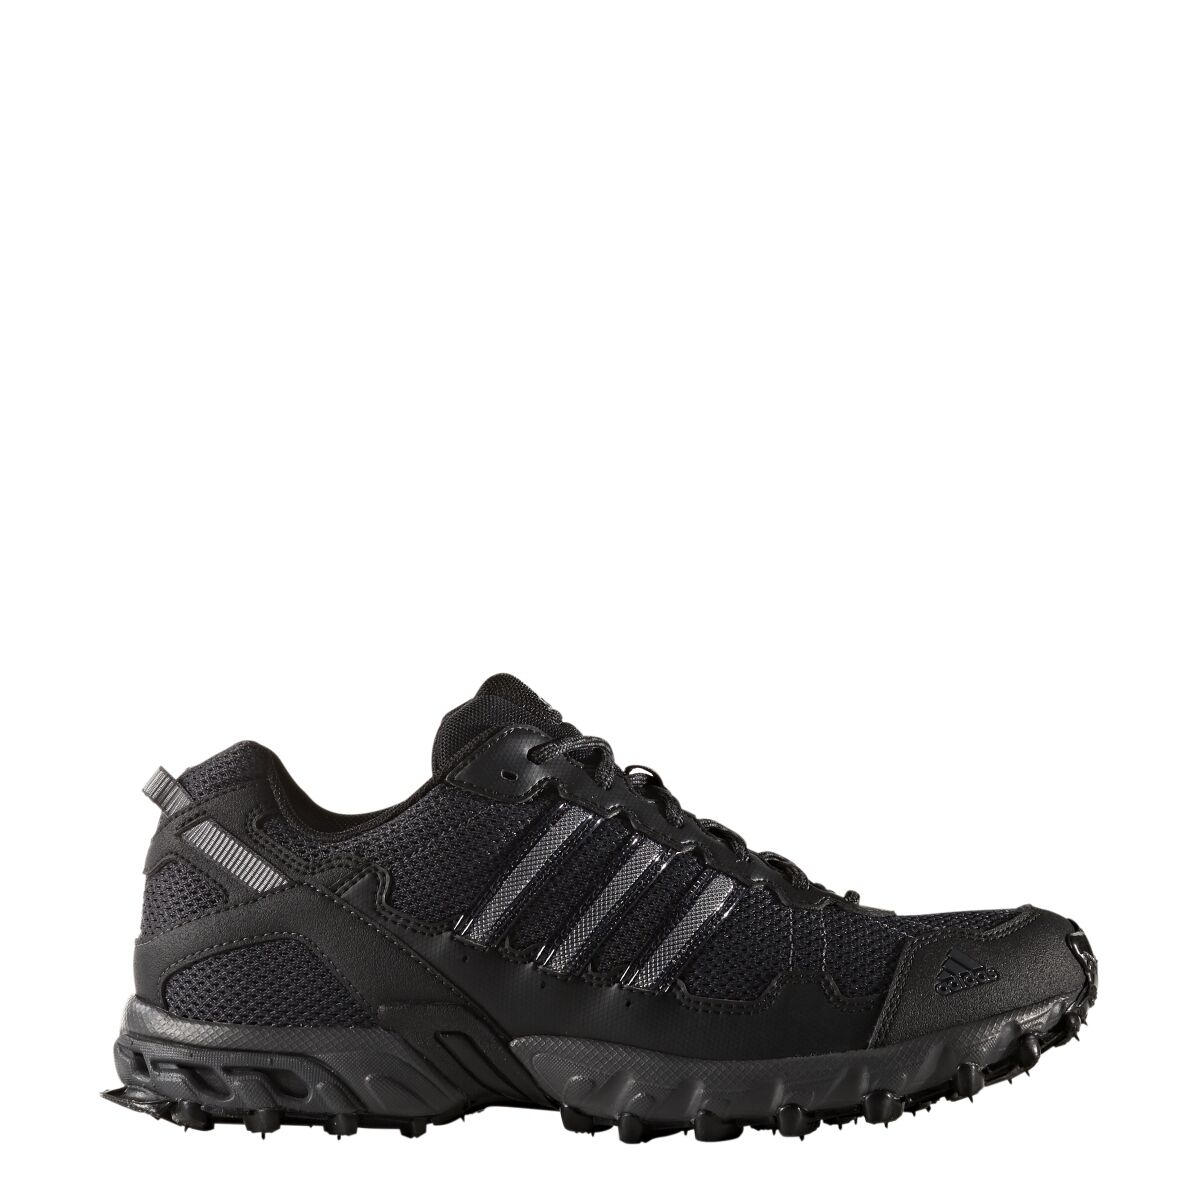 Mens Adidas Rockadia Trail Black Sport Athletic Running Shoe BY1791 Size 9.5